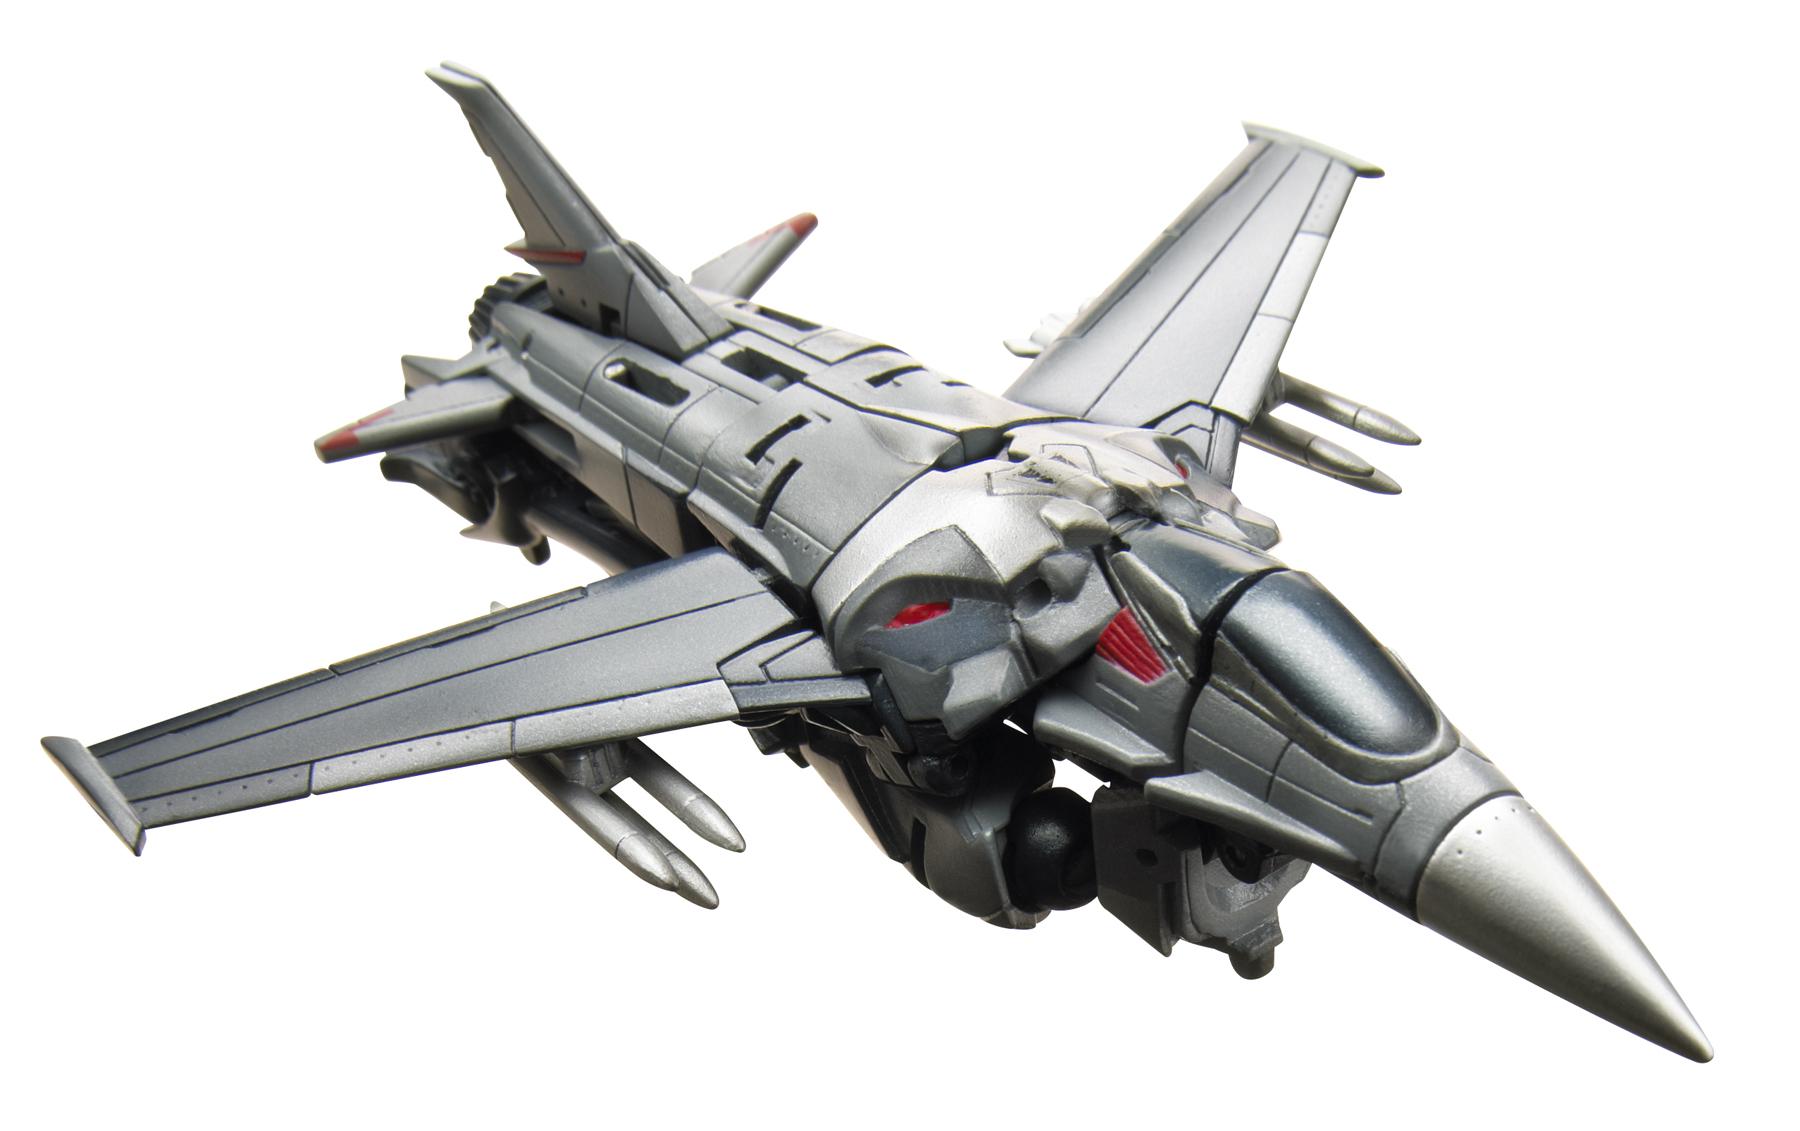 Transformers Prime Starscream Toy